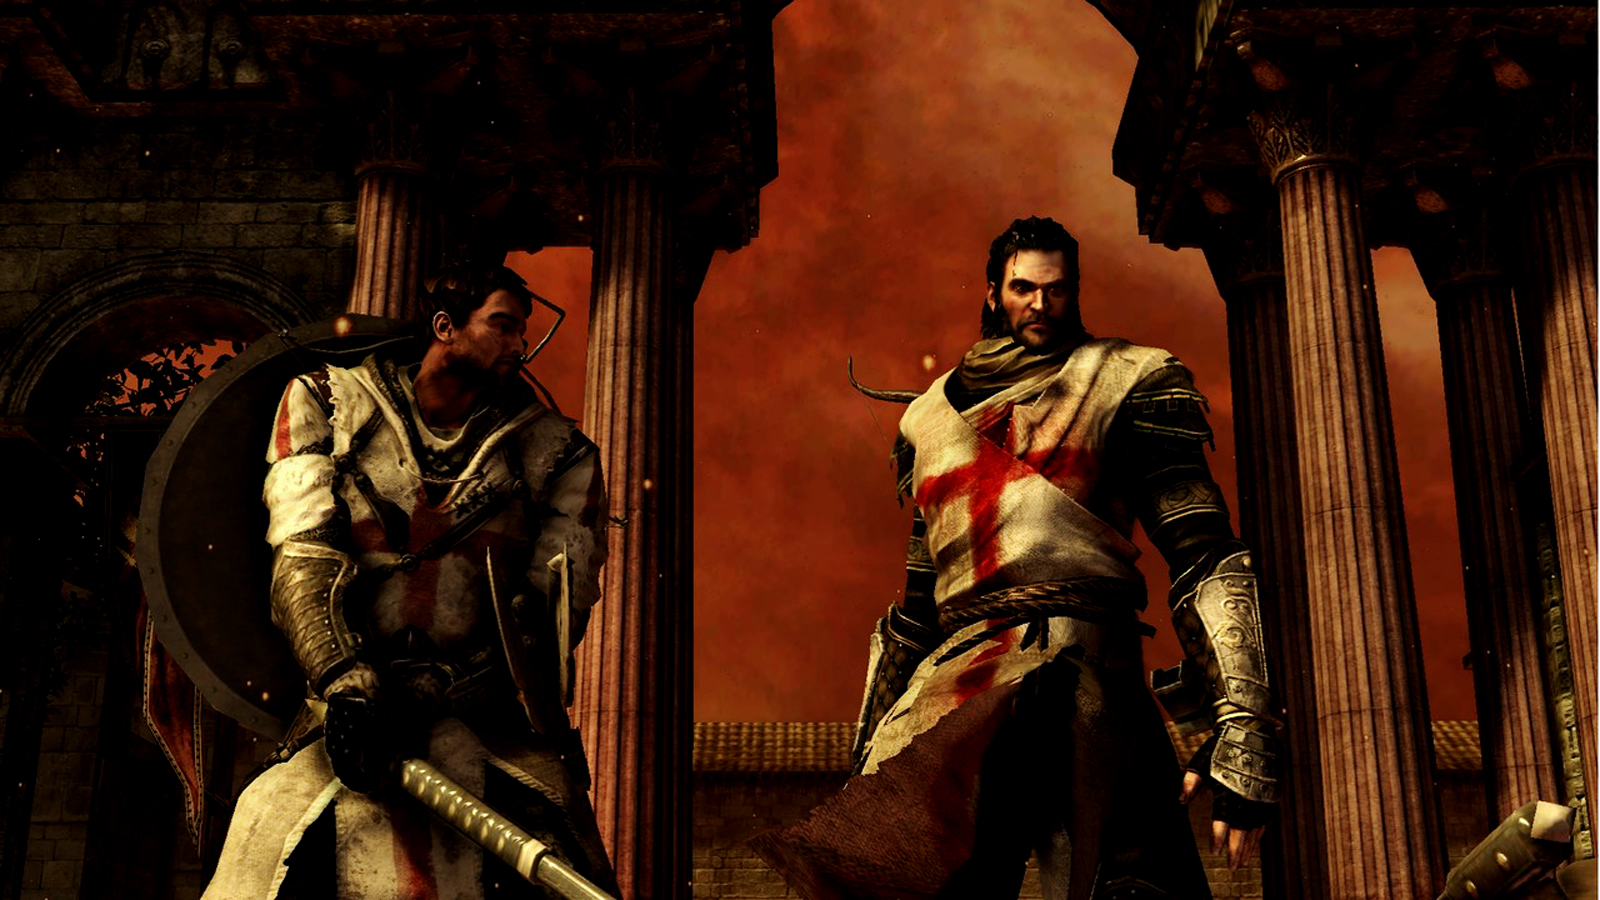 http://1.bp.blogspot.com/-Akuf8uixsBU/TtJ5AFdhO_I/AAAAAAAAEno/dP9AI3pqjpY/s1600/The_Cursed_Crusade_Game_Wallpaper_Vvallpaper.Net.jpg